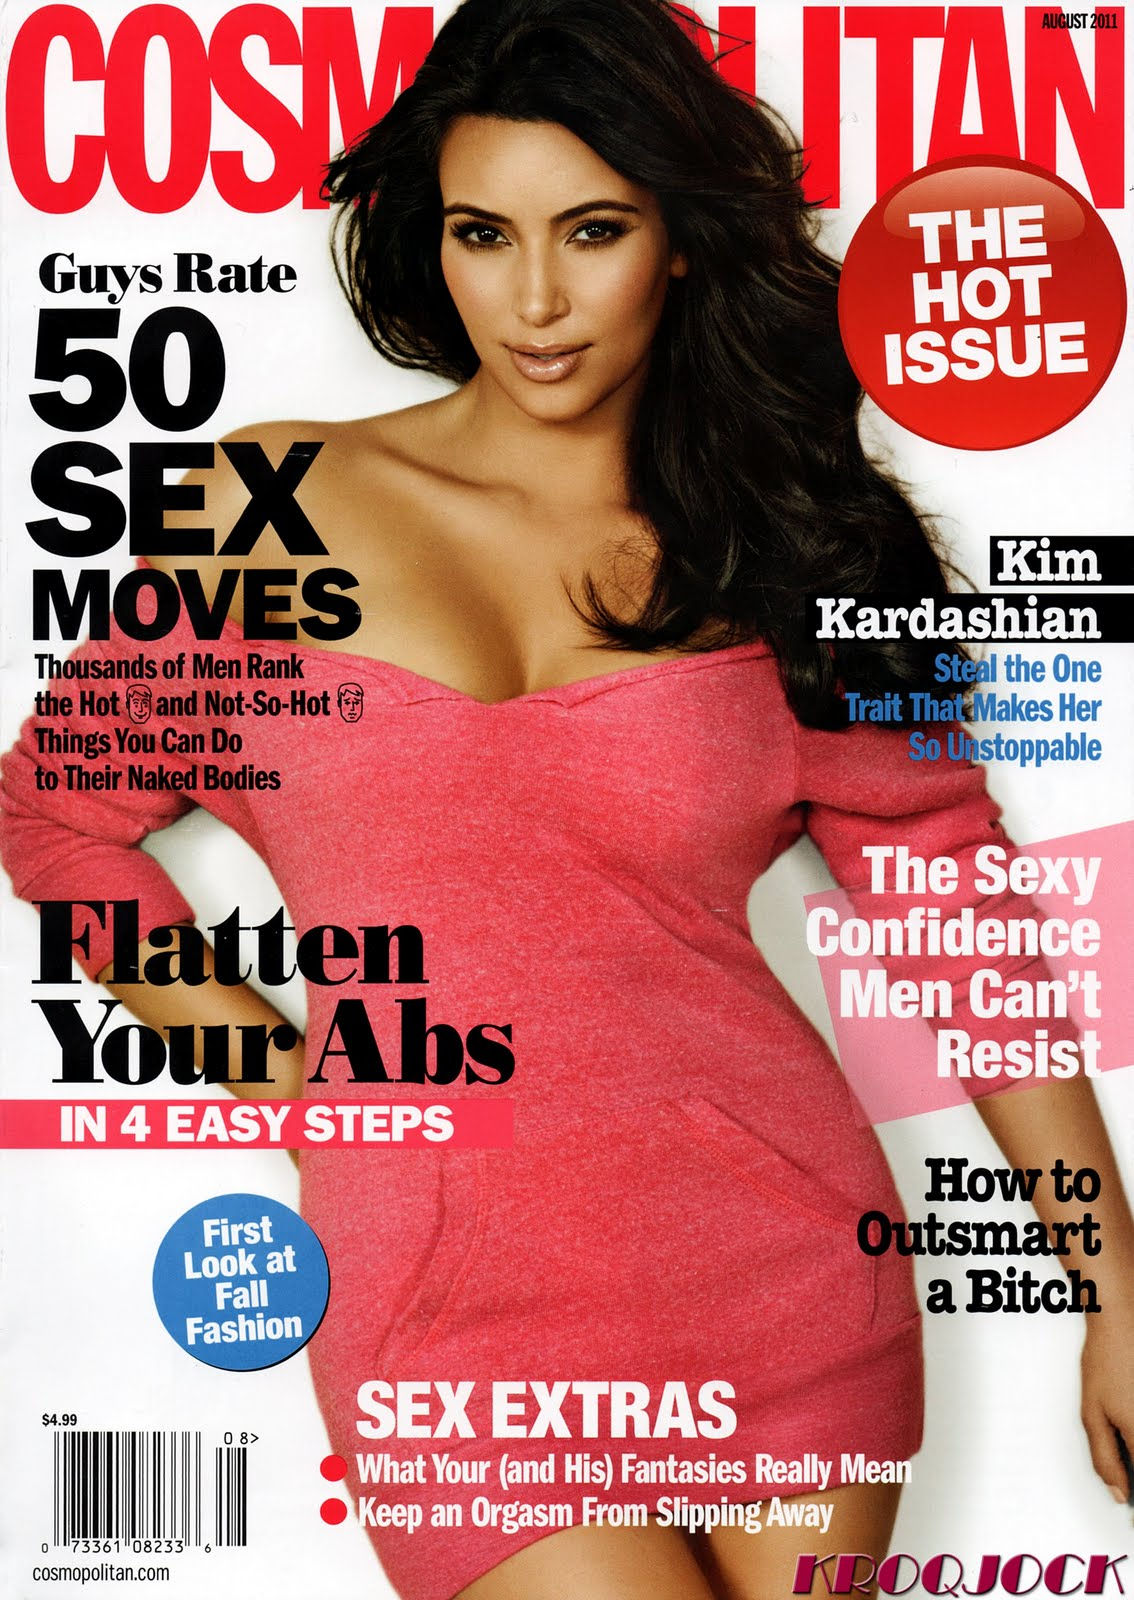 http://4.bp.blogspot.com/-Xab_4gr0kIc/Th_eN5M_21I/AAAAAAAACeo/q3QnHemEPF4/s1600/Cosmopolitan+August+2011+pdf+Kim+Kardashian+Cosmo+August+2011+Cover+Girl+Kim-Kardashian-on-Cosmopolitan-Magazine-Cover-August-2011-1.jpg